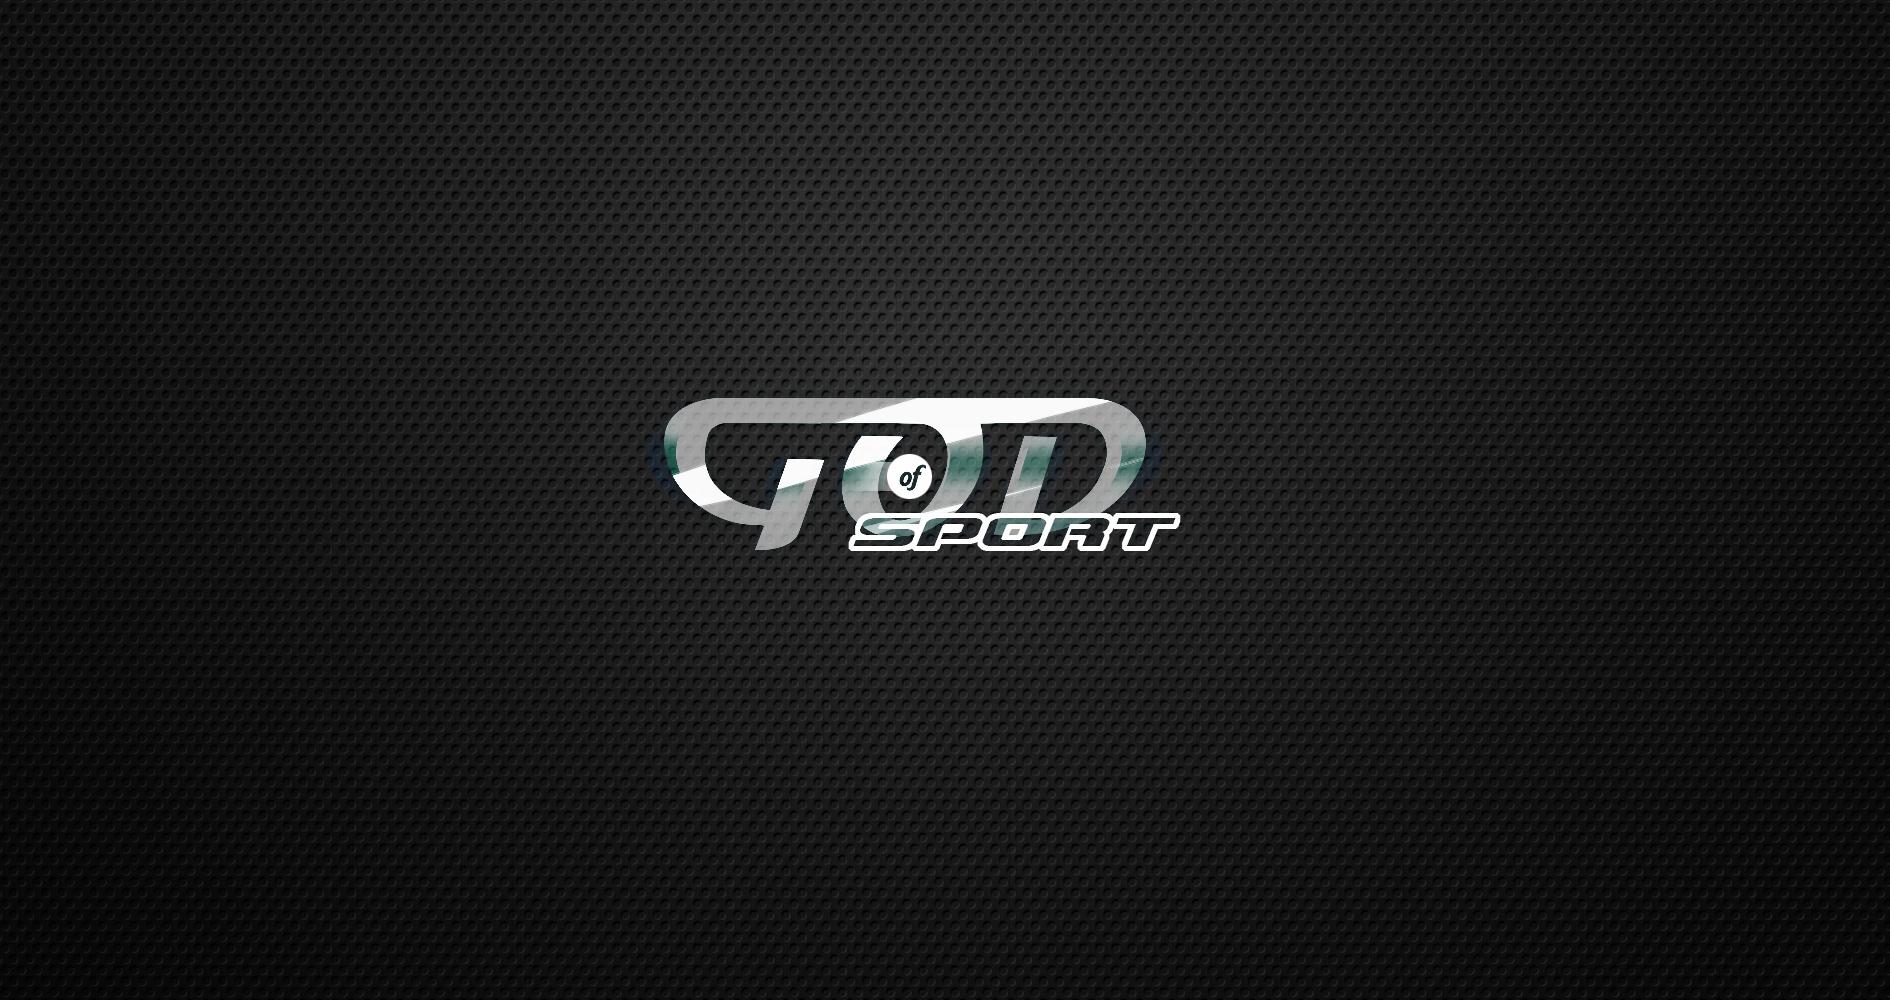 GodOfSport logo Videogame